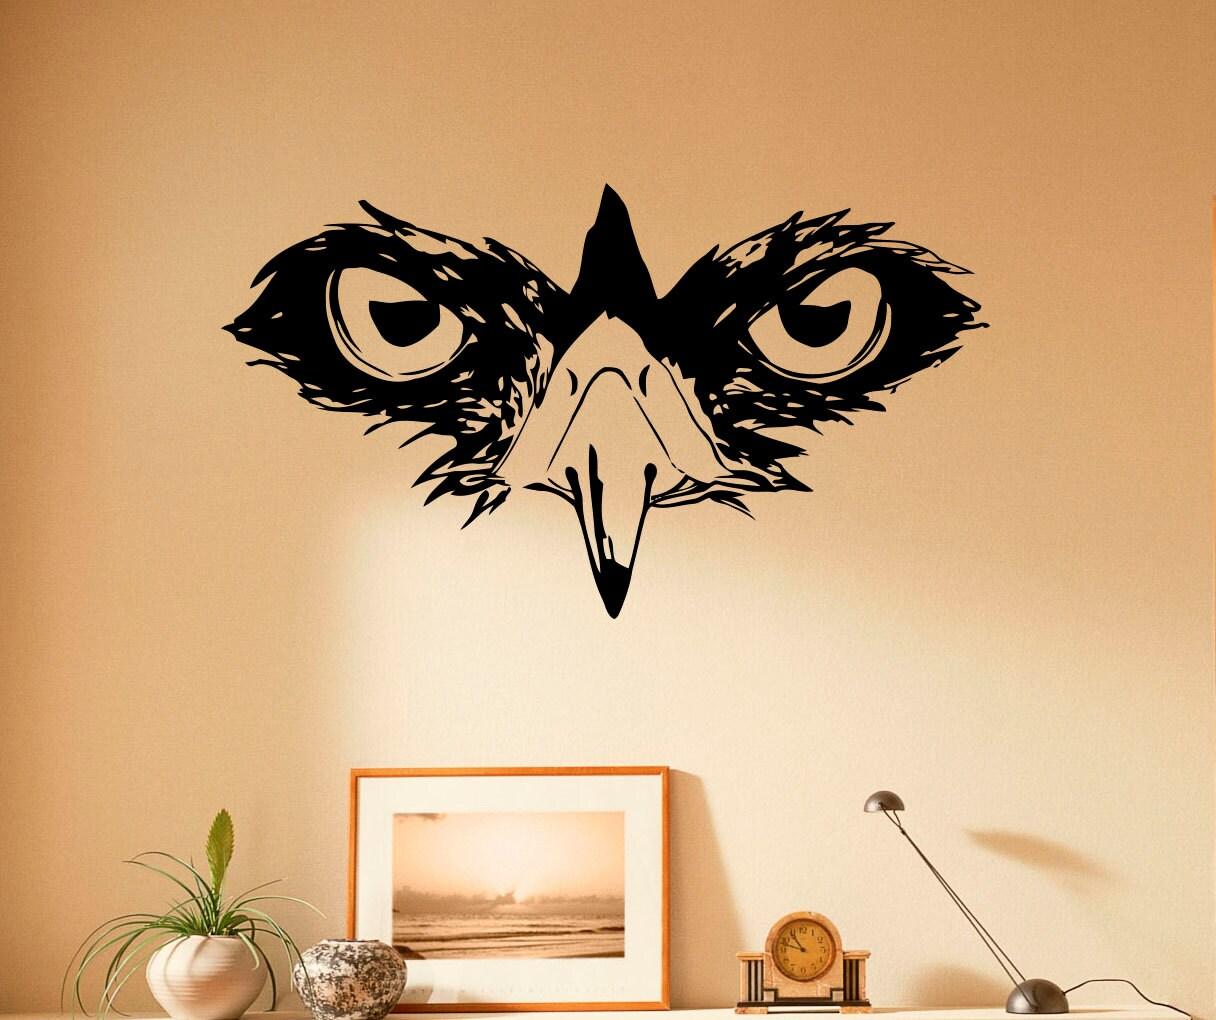 Muzzle Owl Wall Decal Eyes Owl Vinyl Stickers Bird Animal Home | Etsy